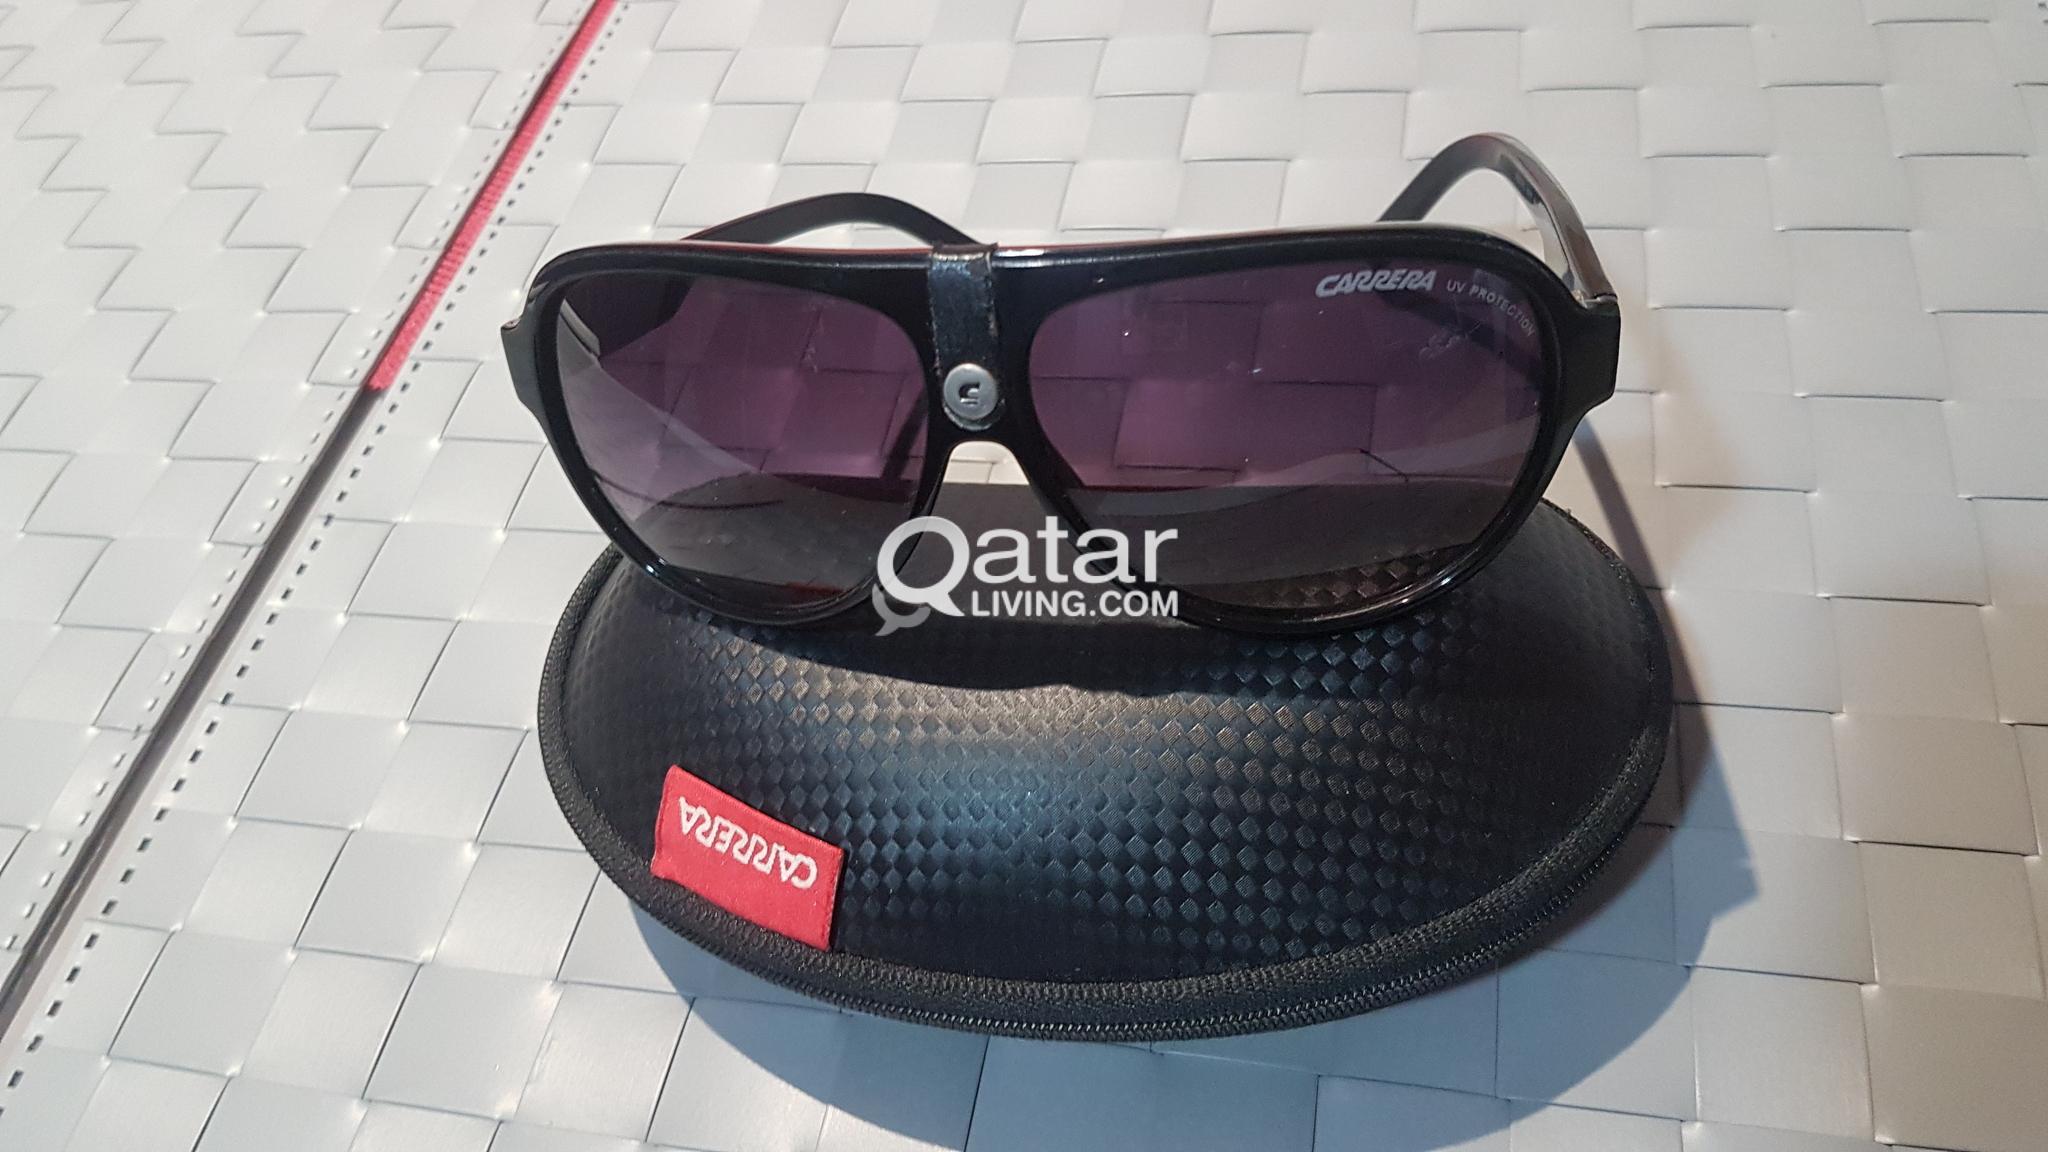 fa1ece85a59 title · title · title. Information. Original Carrera Sunglasses ...